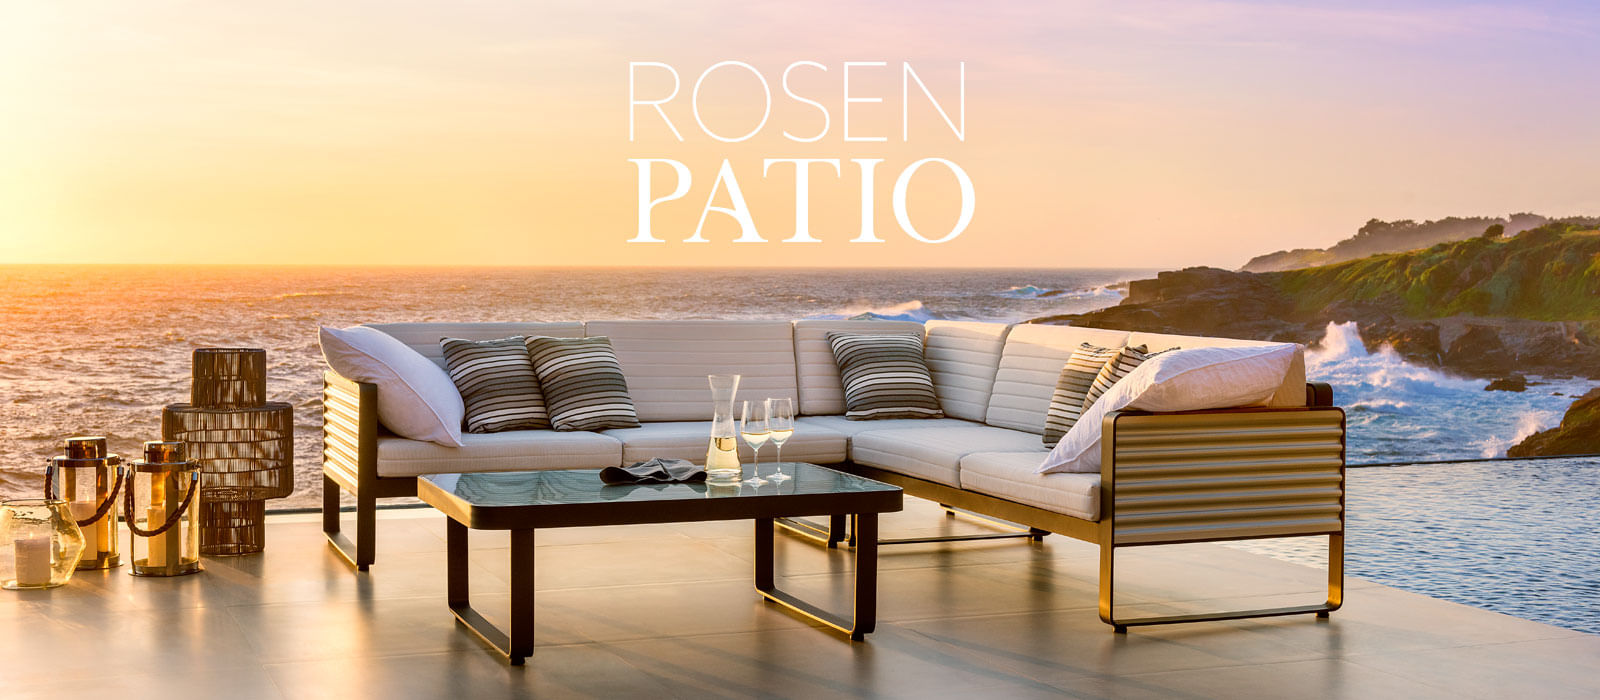 Muebles de terraza rosen per - Muebles de terrazas ...